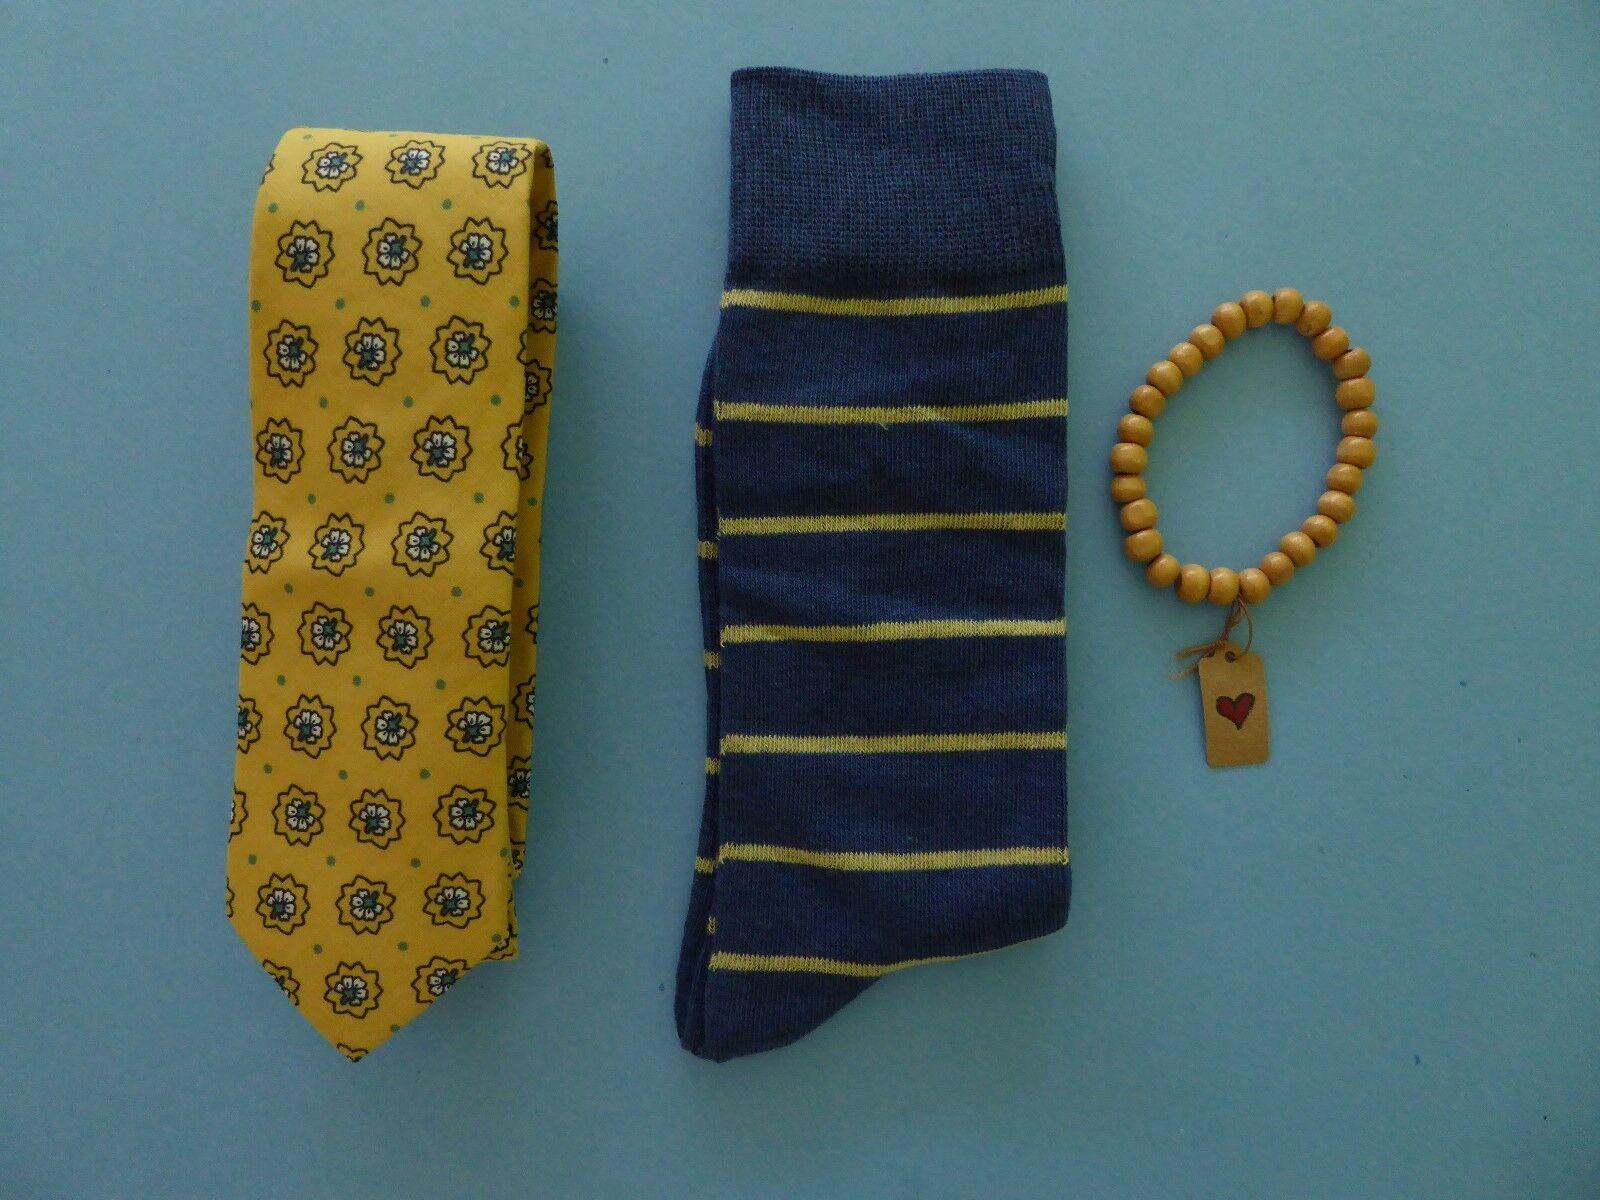 Harrison Blake Floral Yellow Tie + Tropicalia Handcrafted Bracelet + Blue Socks